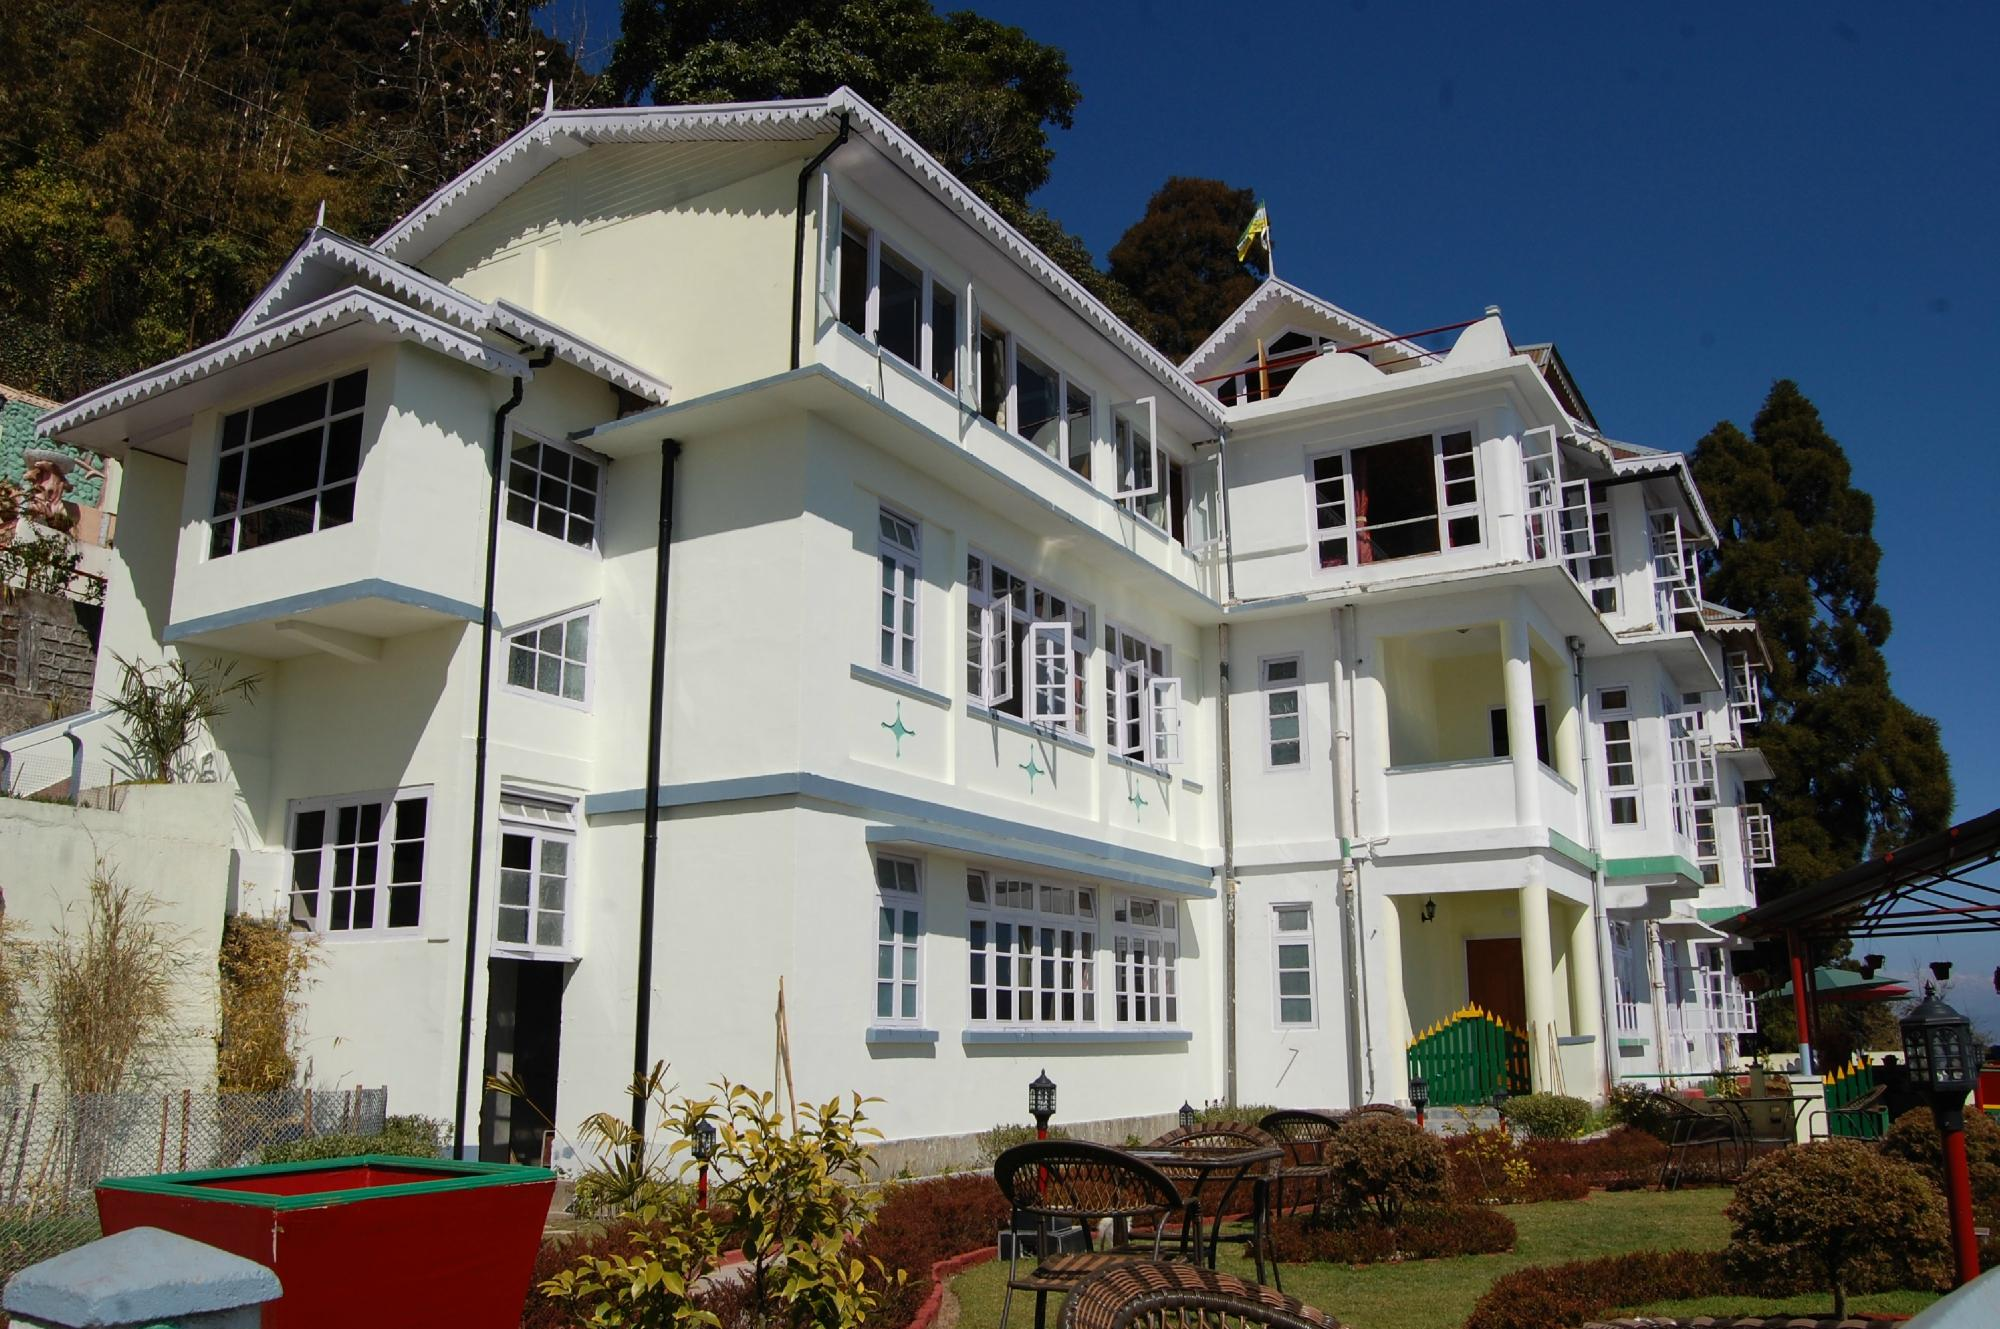 Dhukun Homestay - Lava - Darjeeling Image